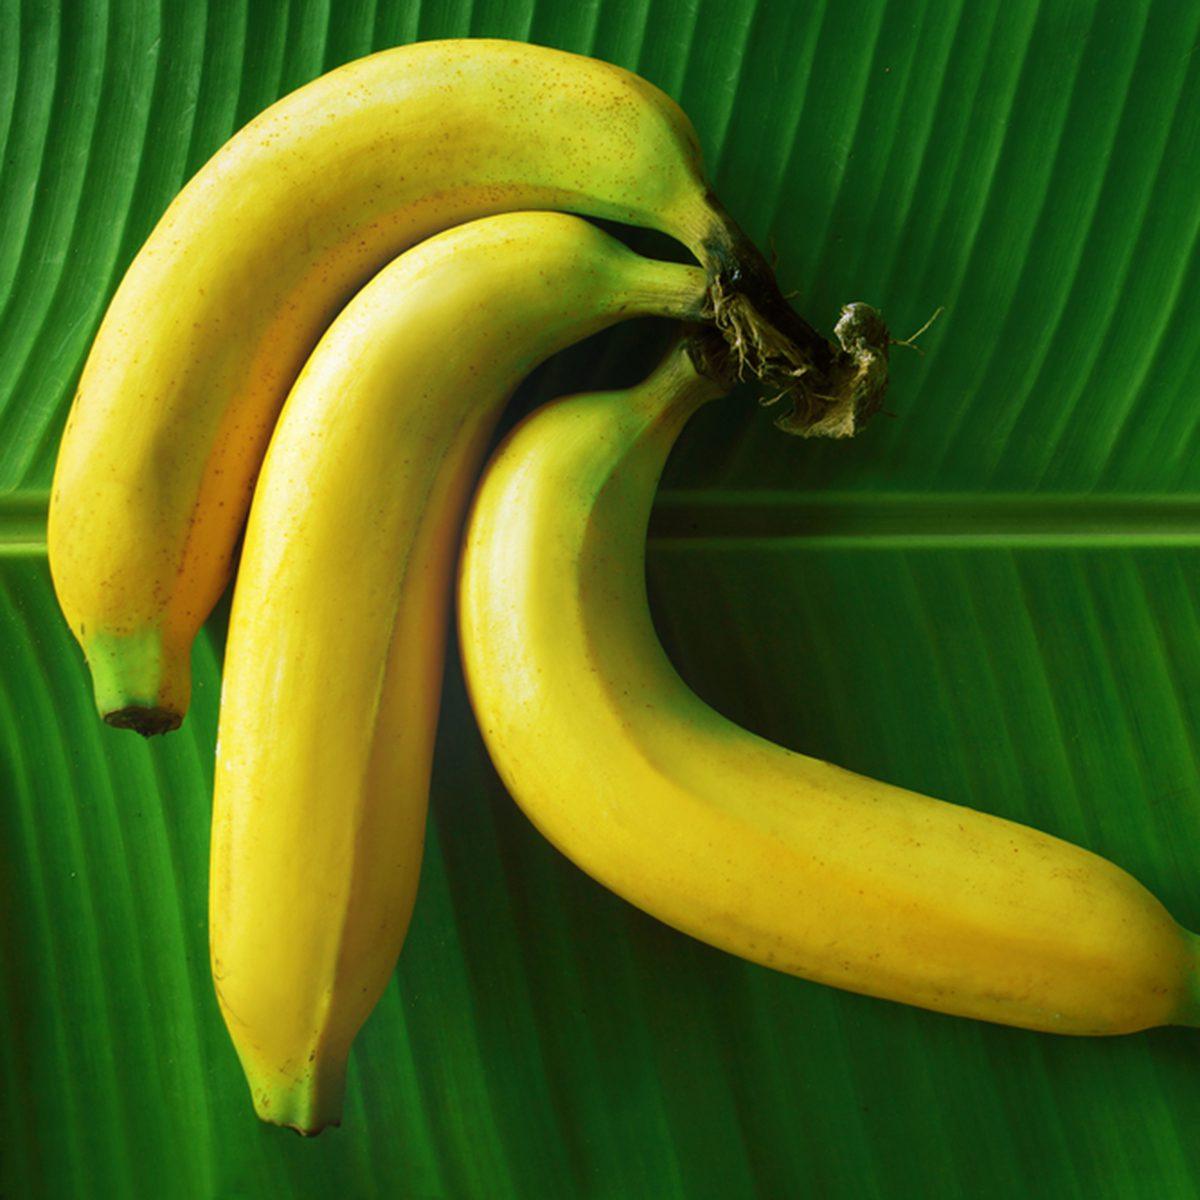 Banana snack on a banana leaf